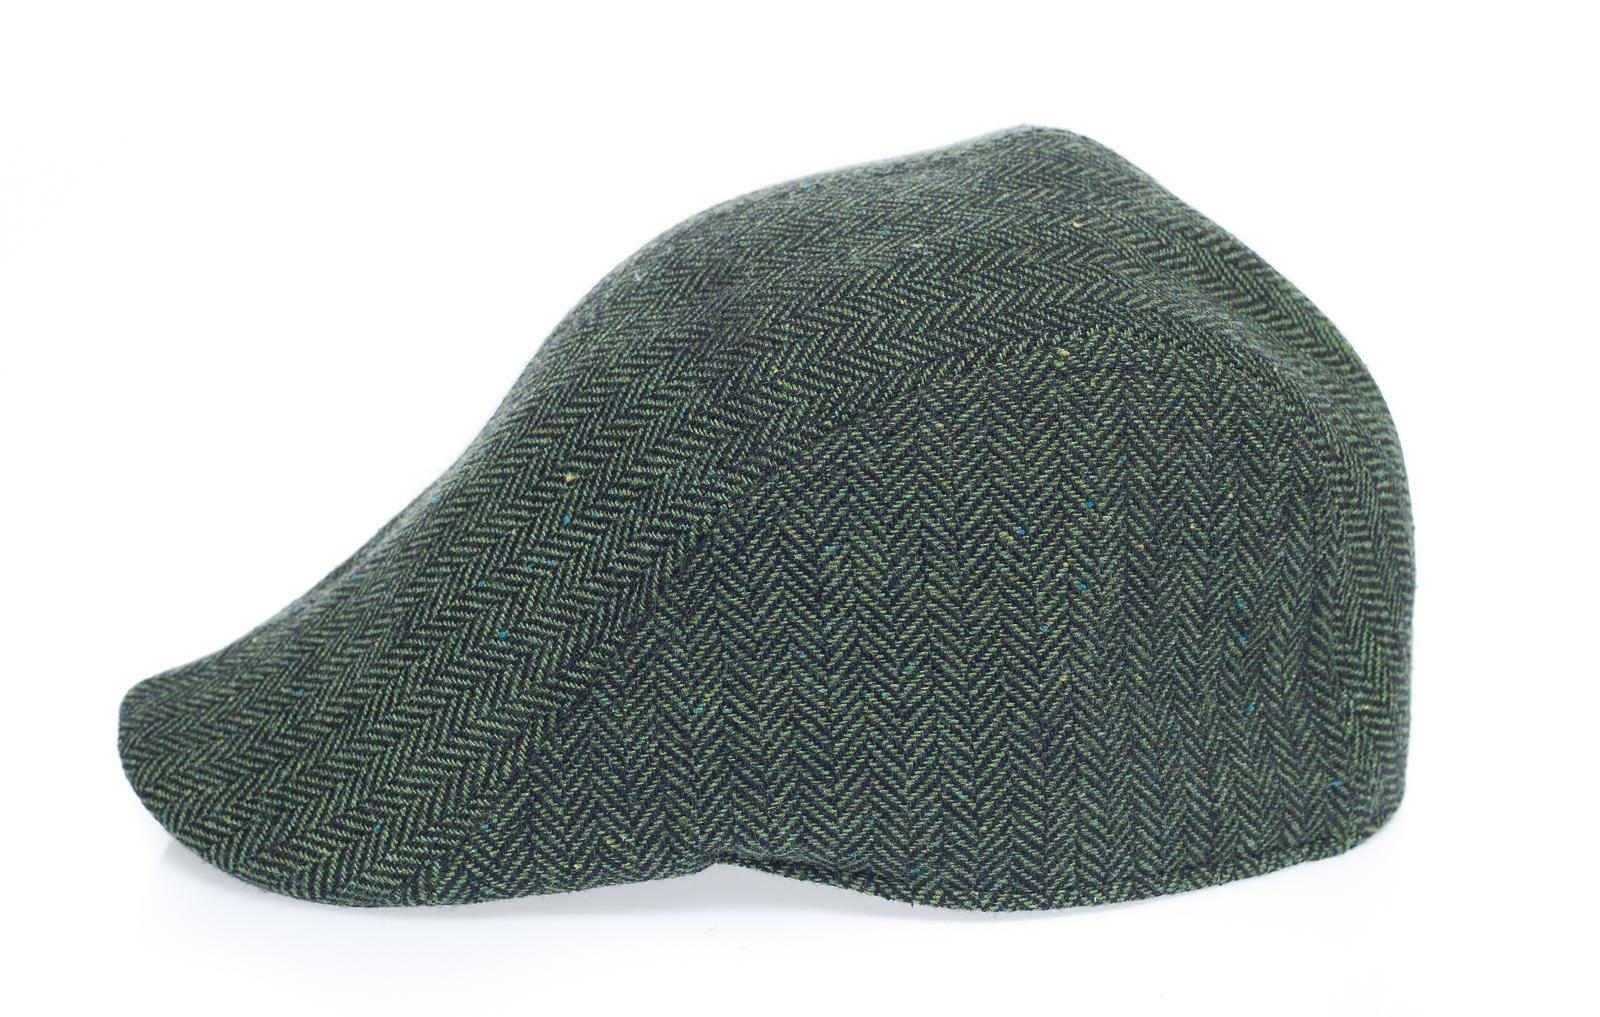 Newsboy Wool Blend Cap Paperboy Men Boy Gatsby Hipster Ivy Hat, Herringbone Green Grey